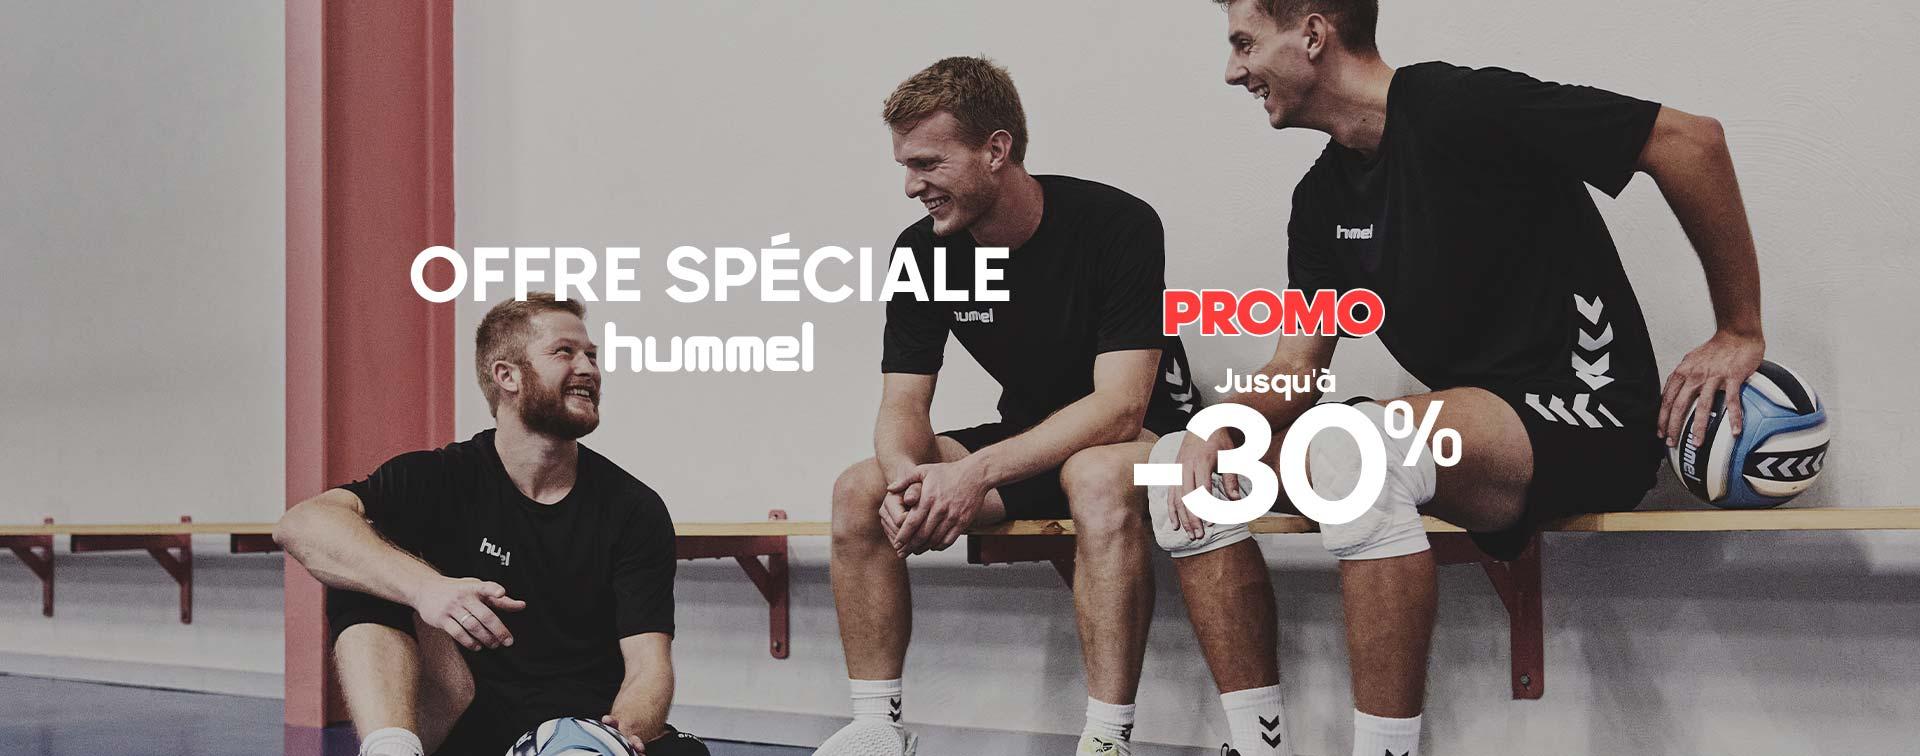 Hummel promo